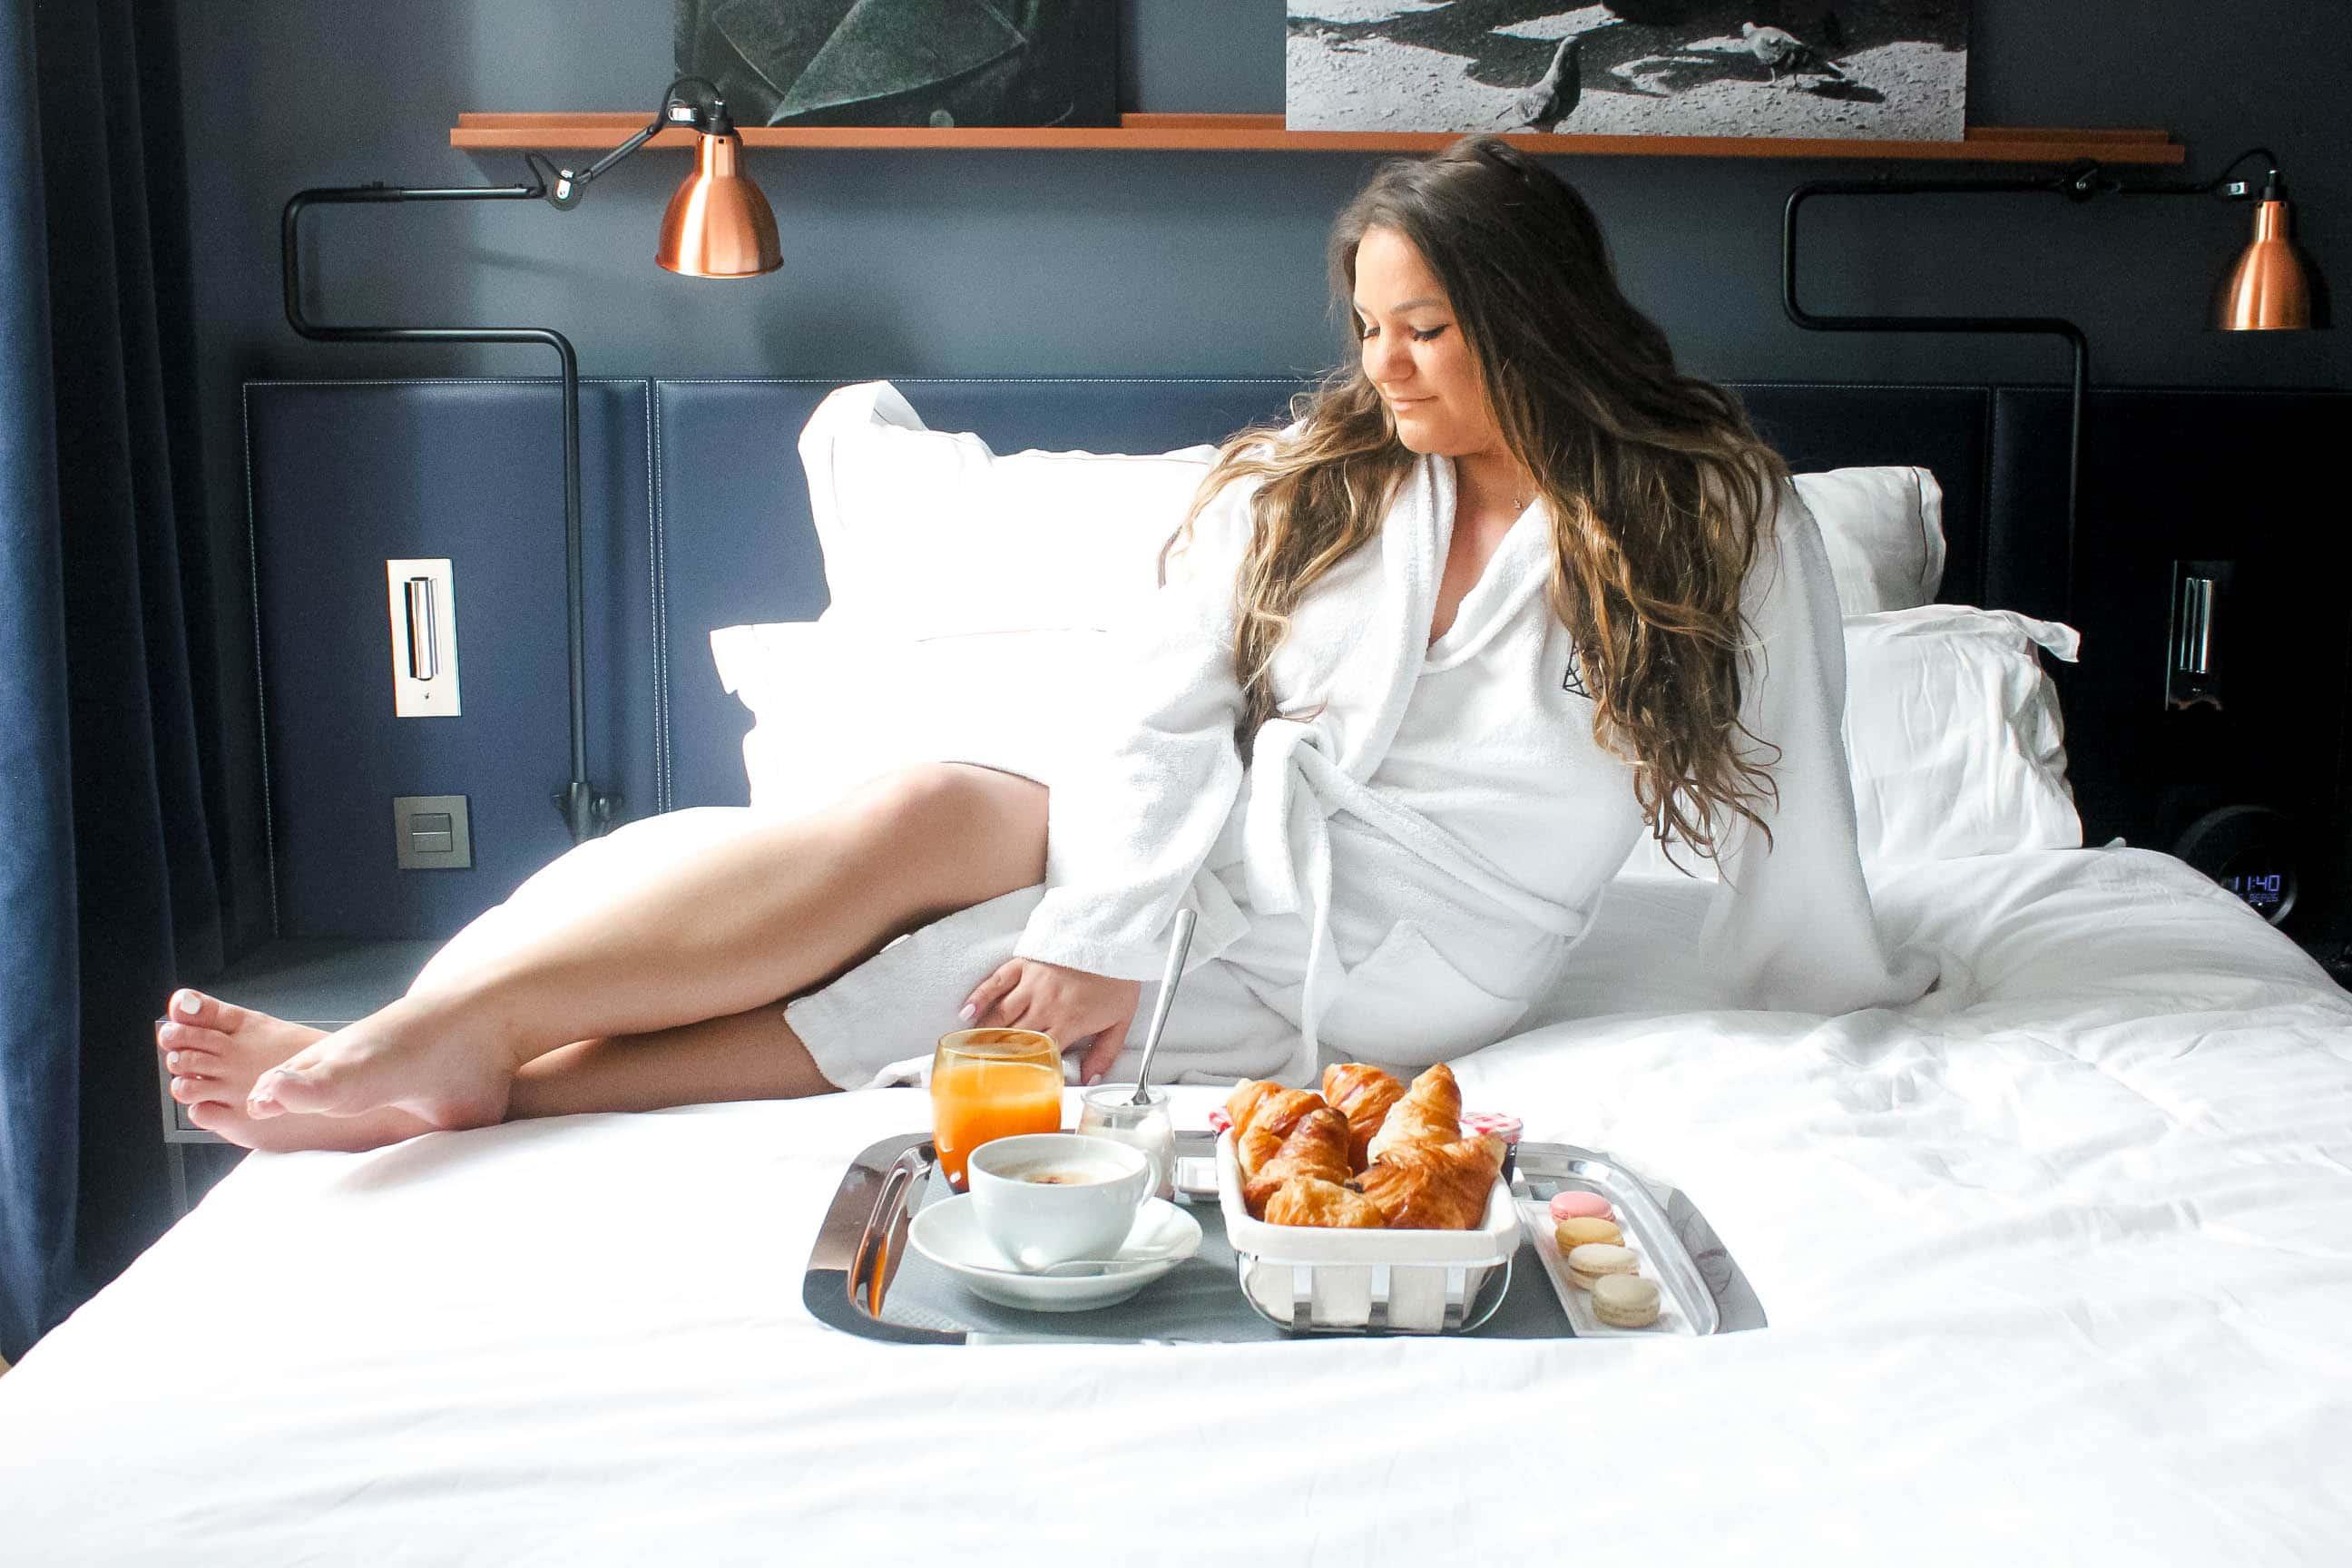 breakfast in bed, room service, missyonmadison, missyonmadison instagram, bloglovin, travel blog, travel blogger, fashion blogger, style blogger, fashion blog, pfw, paris, paris fashion week, jetaime paris, paris hotel, top paris hotels, hotel square louvois, where to stay in paris, bloglovin travel, wanderlust, 2017 travel guide, 2017 travel, paris in the fall, fall travel, missyonthemove, where to visit in paris,